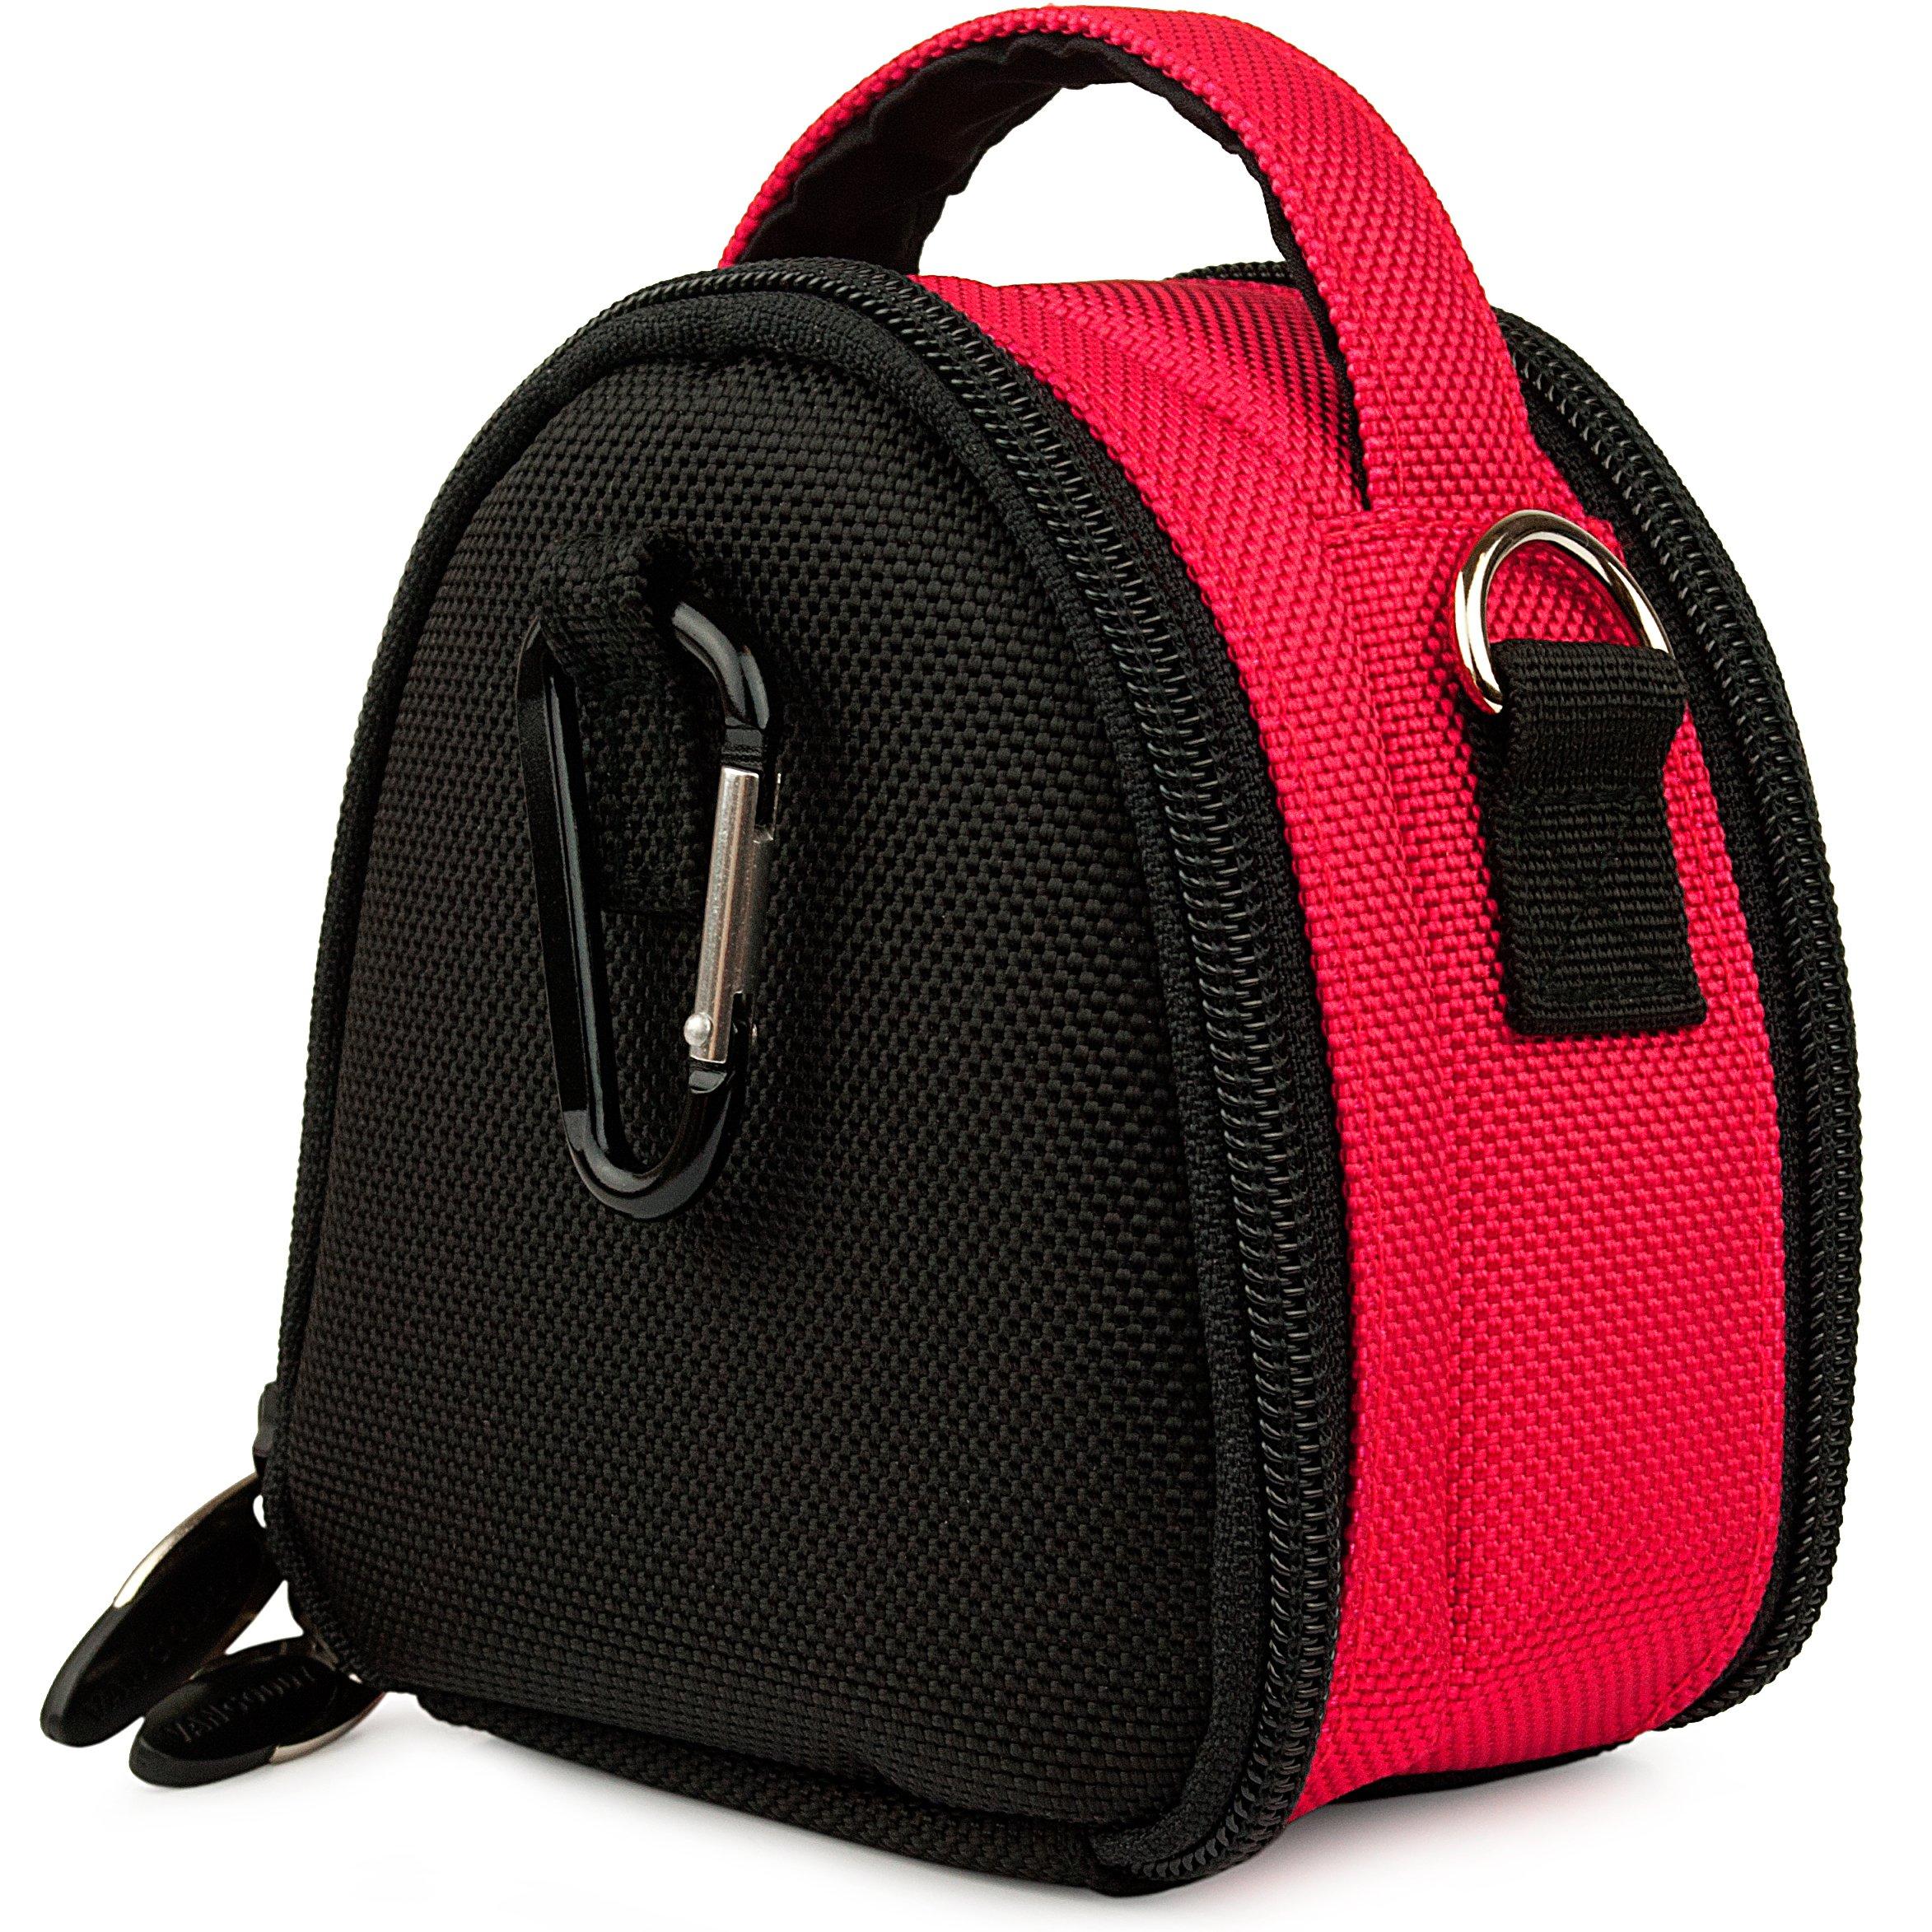 Mini Laurel Handbag Pouch Case for Fujifilm FinePix T500 Digital Camera